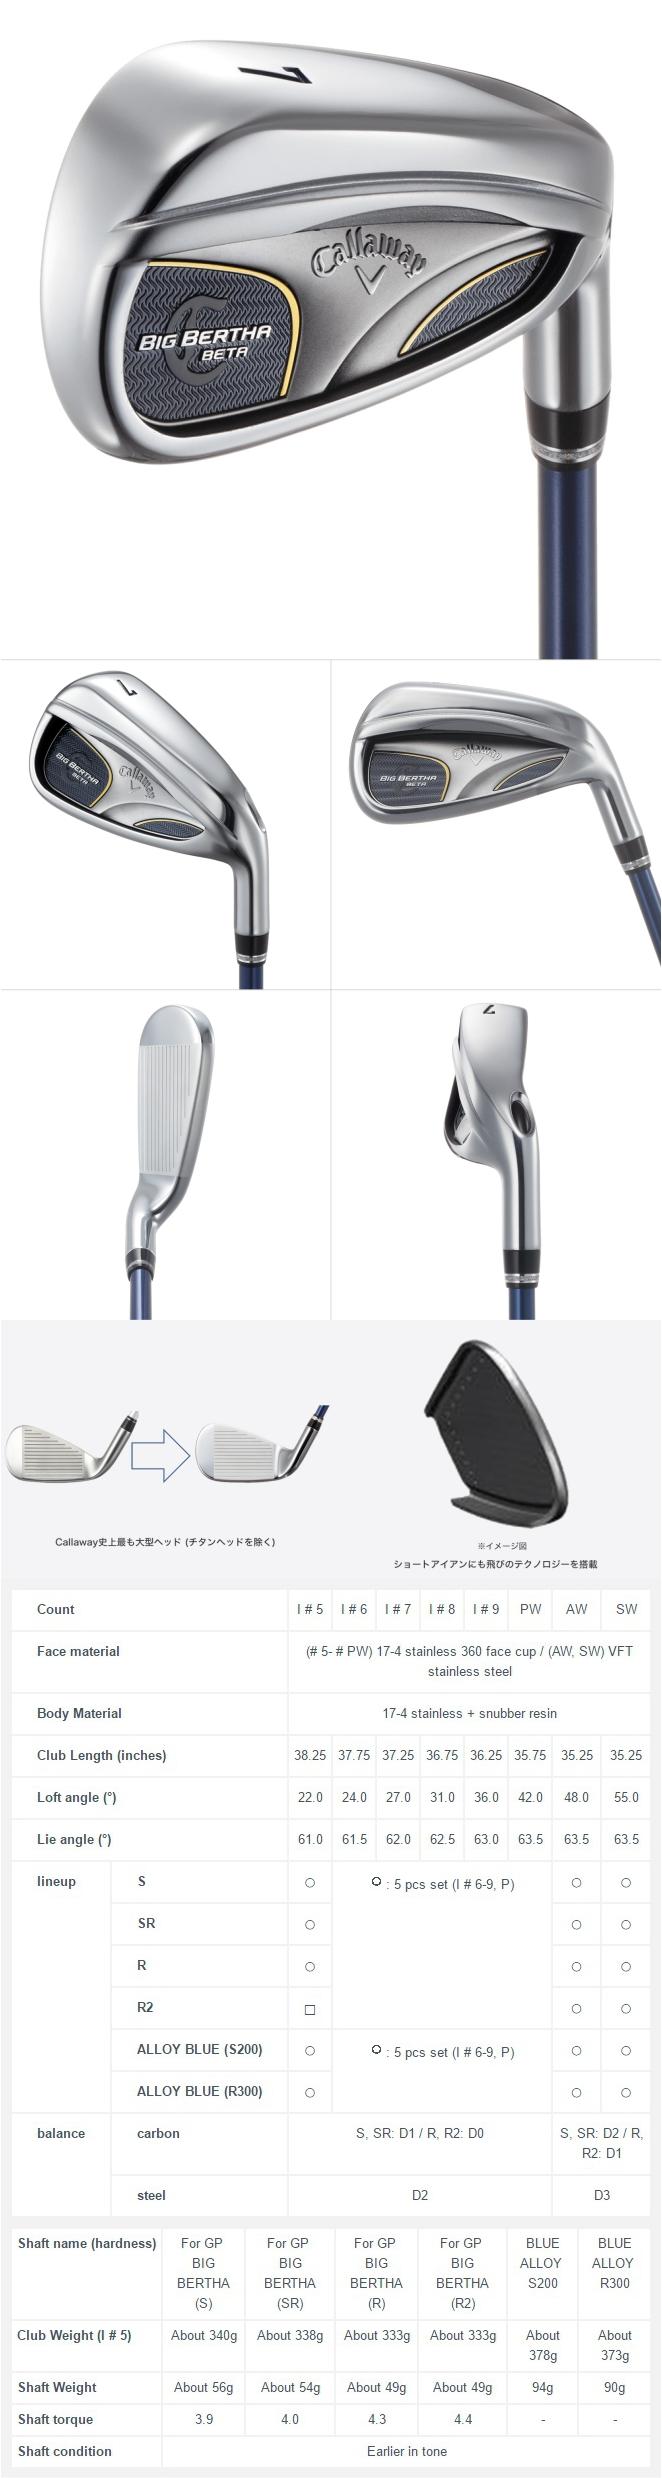 Callaway Japan 2016 Big Bertha Beta Iron